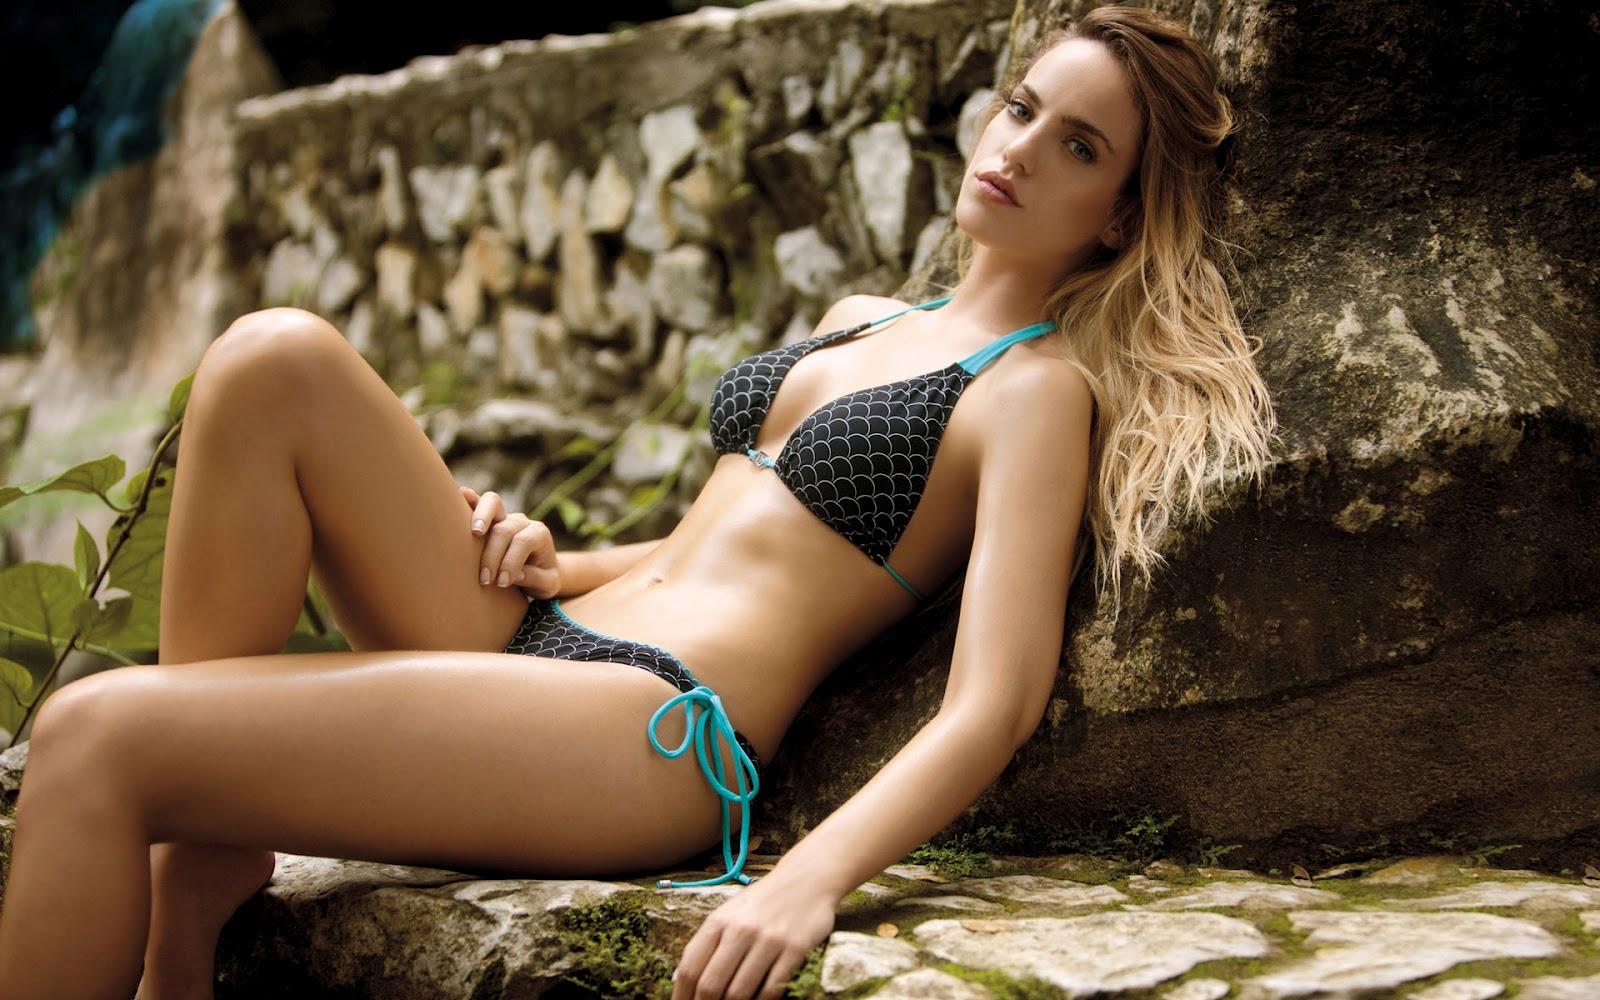 Hot Bikini Girl 2 ~ Photo Collection: Angelina Jolie Hot